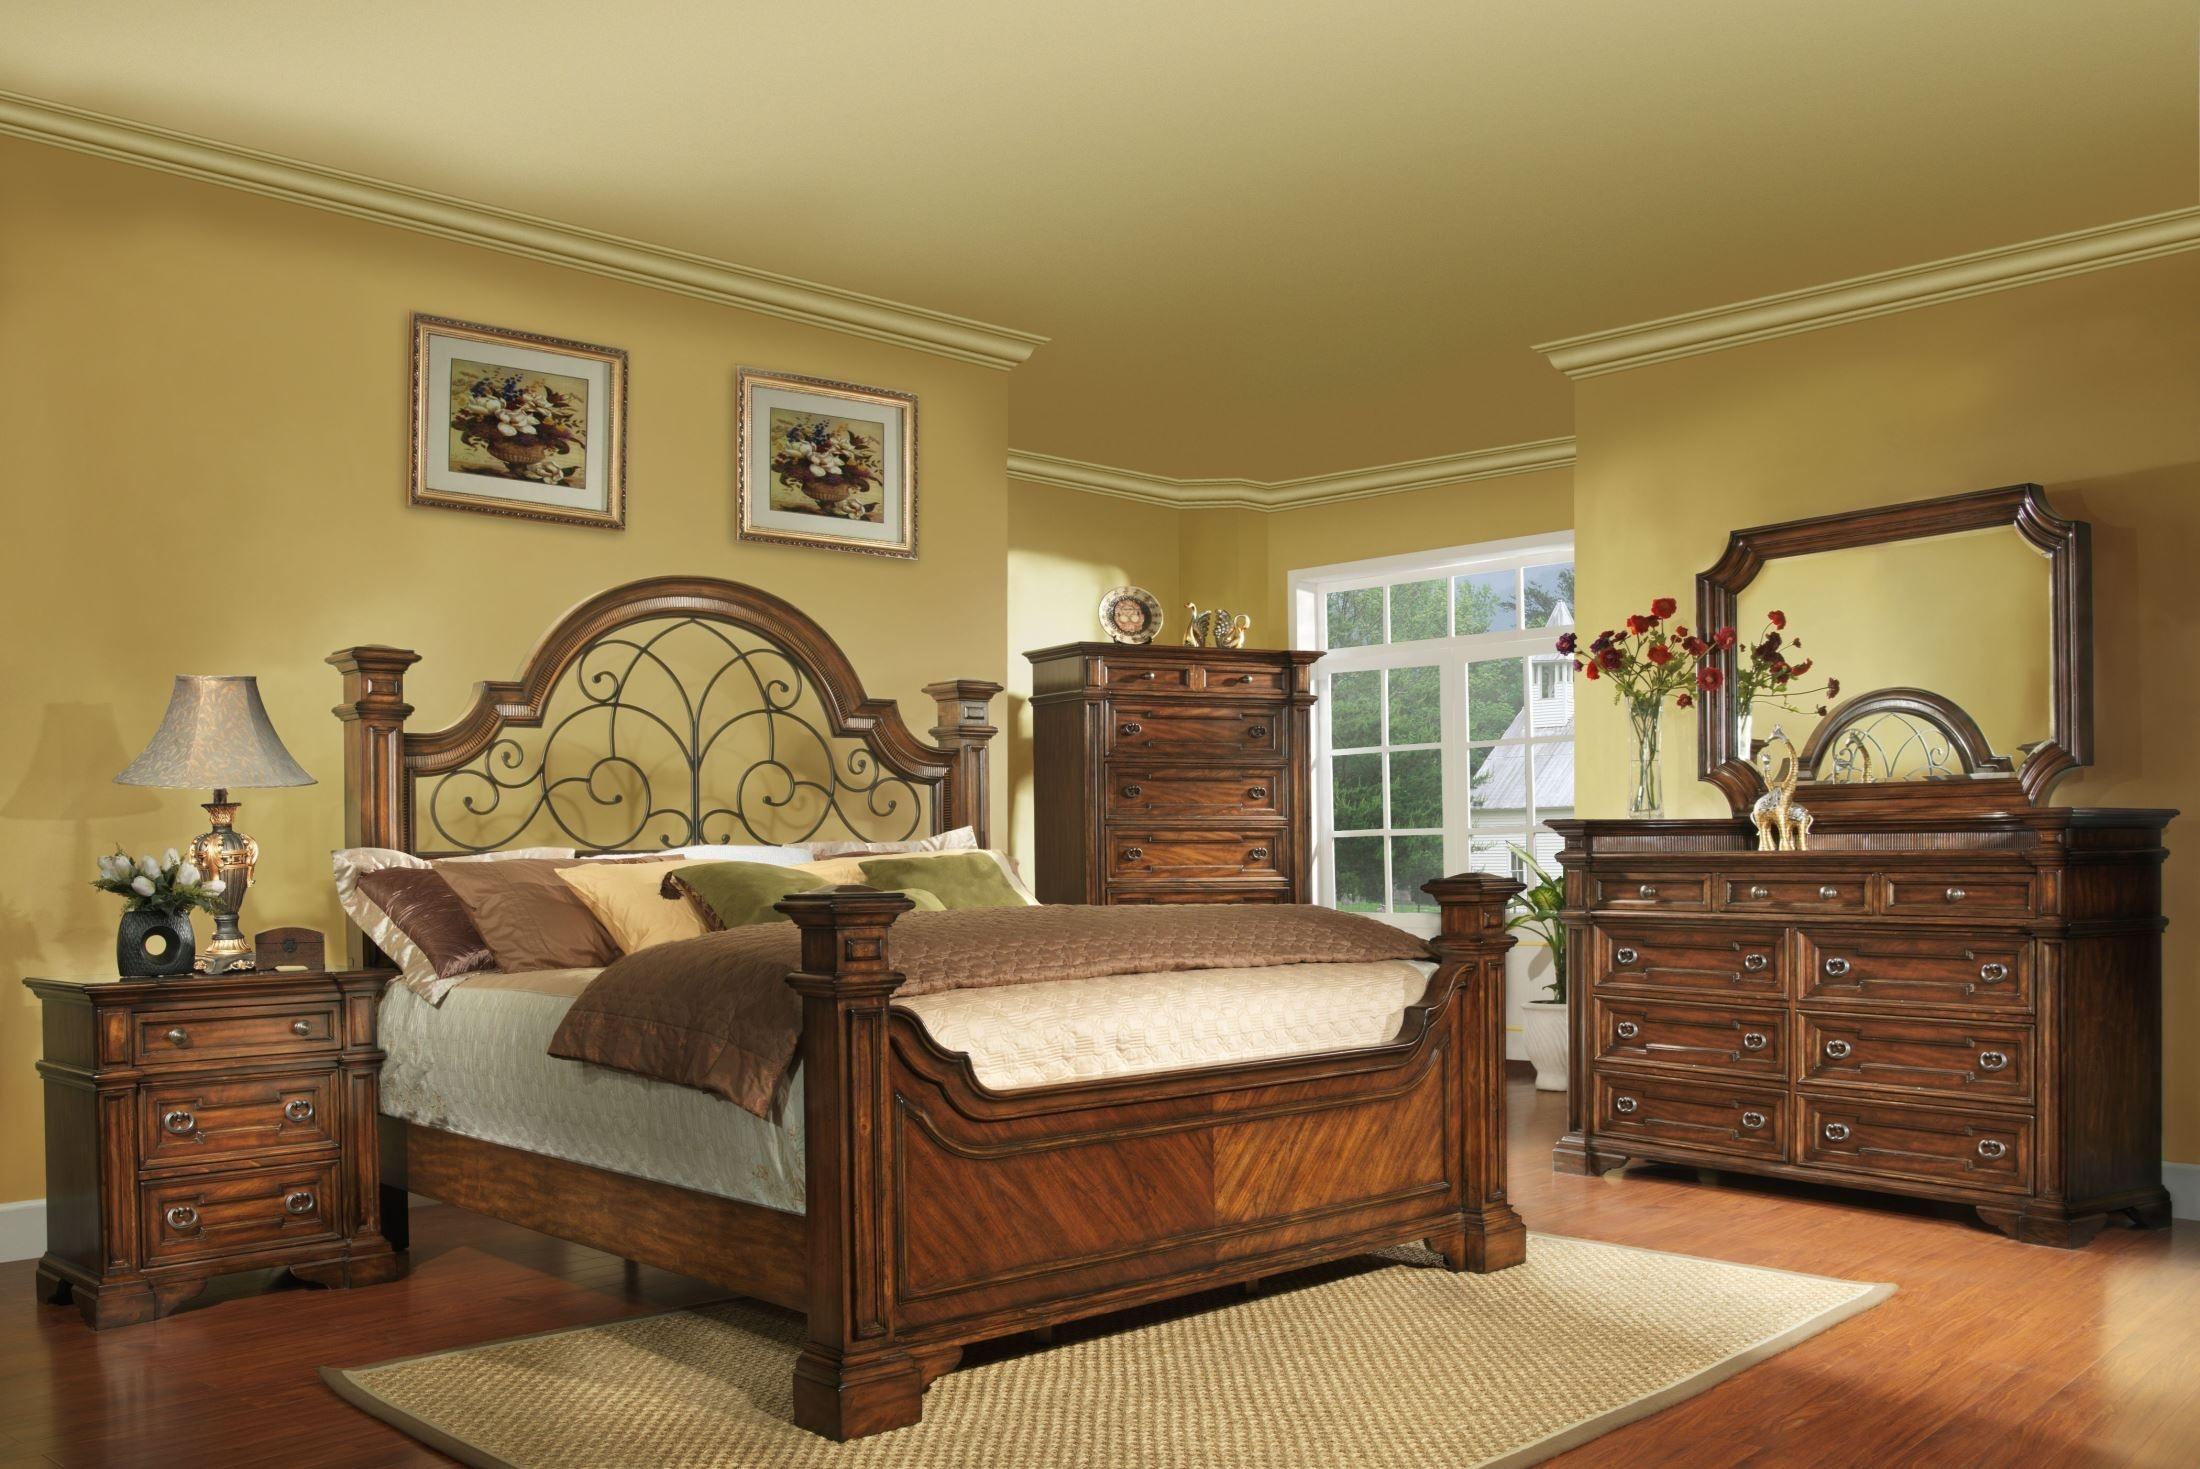 Attirant Metal And Wood Bedroom Sets .